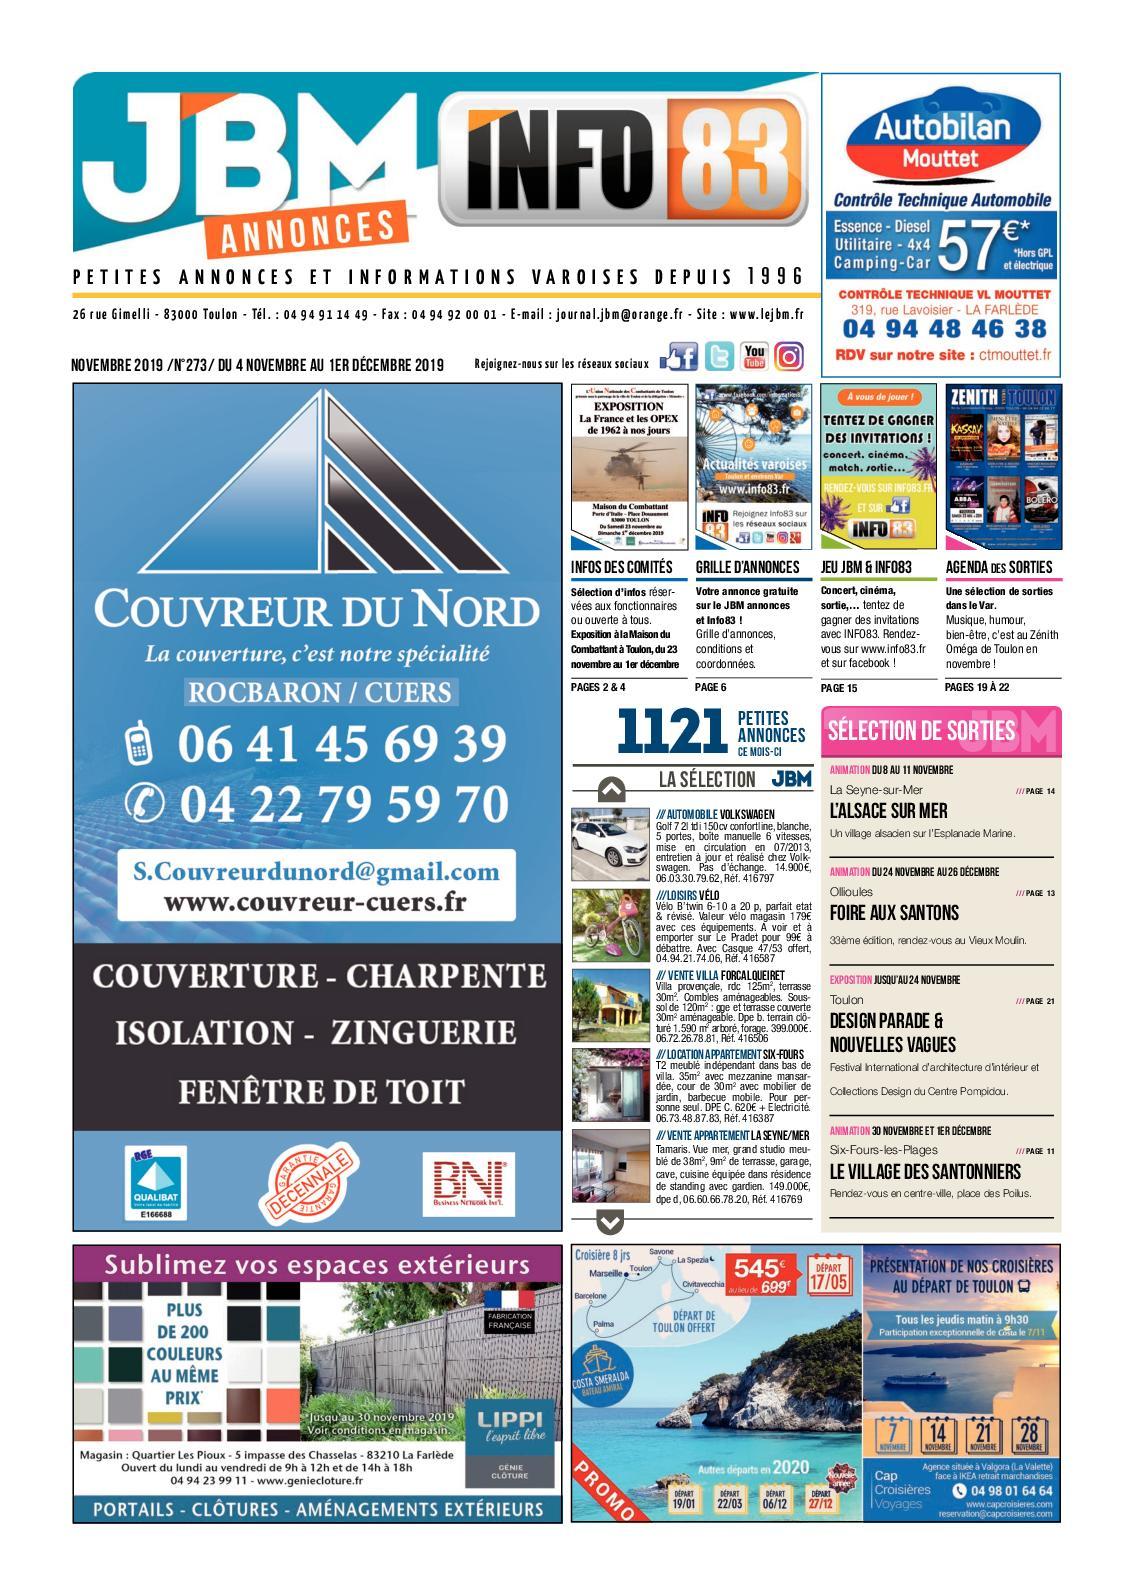 Tapis Pour Caravane Gitan calaméo - jbm273-novembre2019